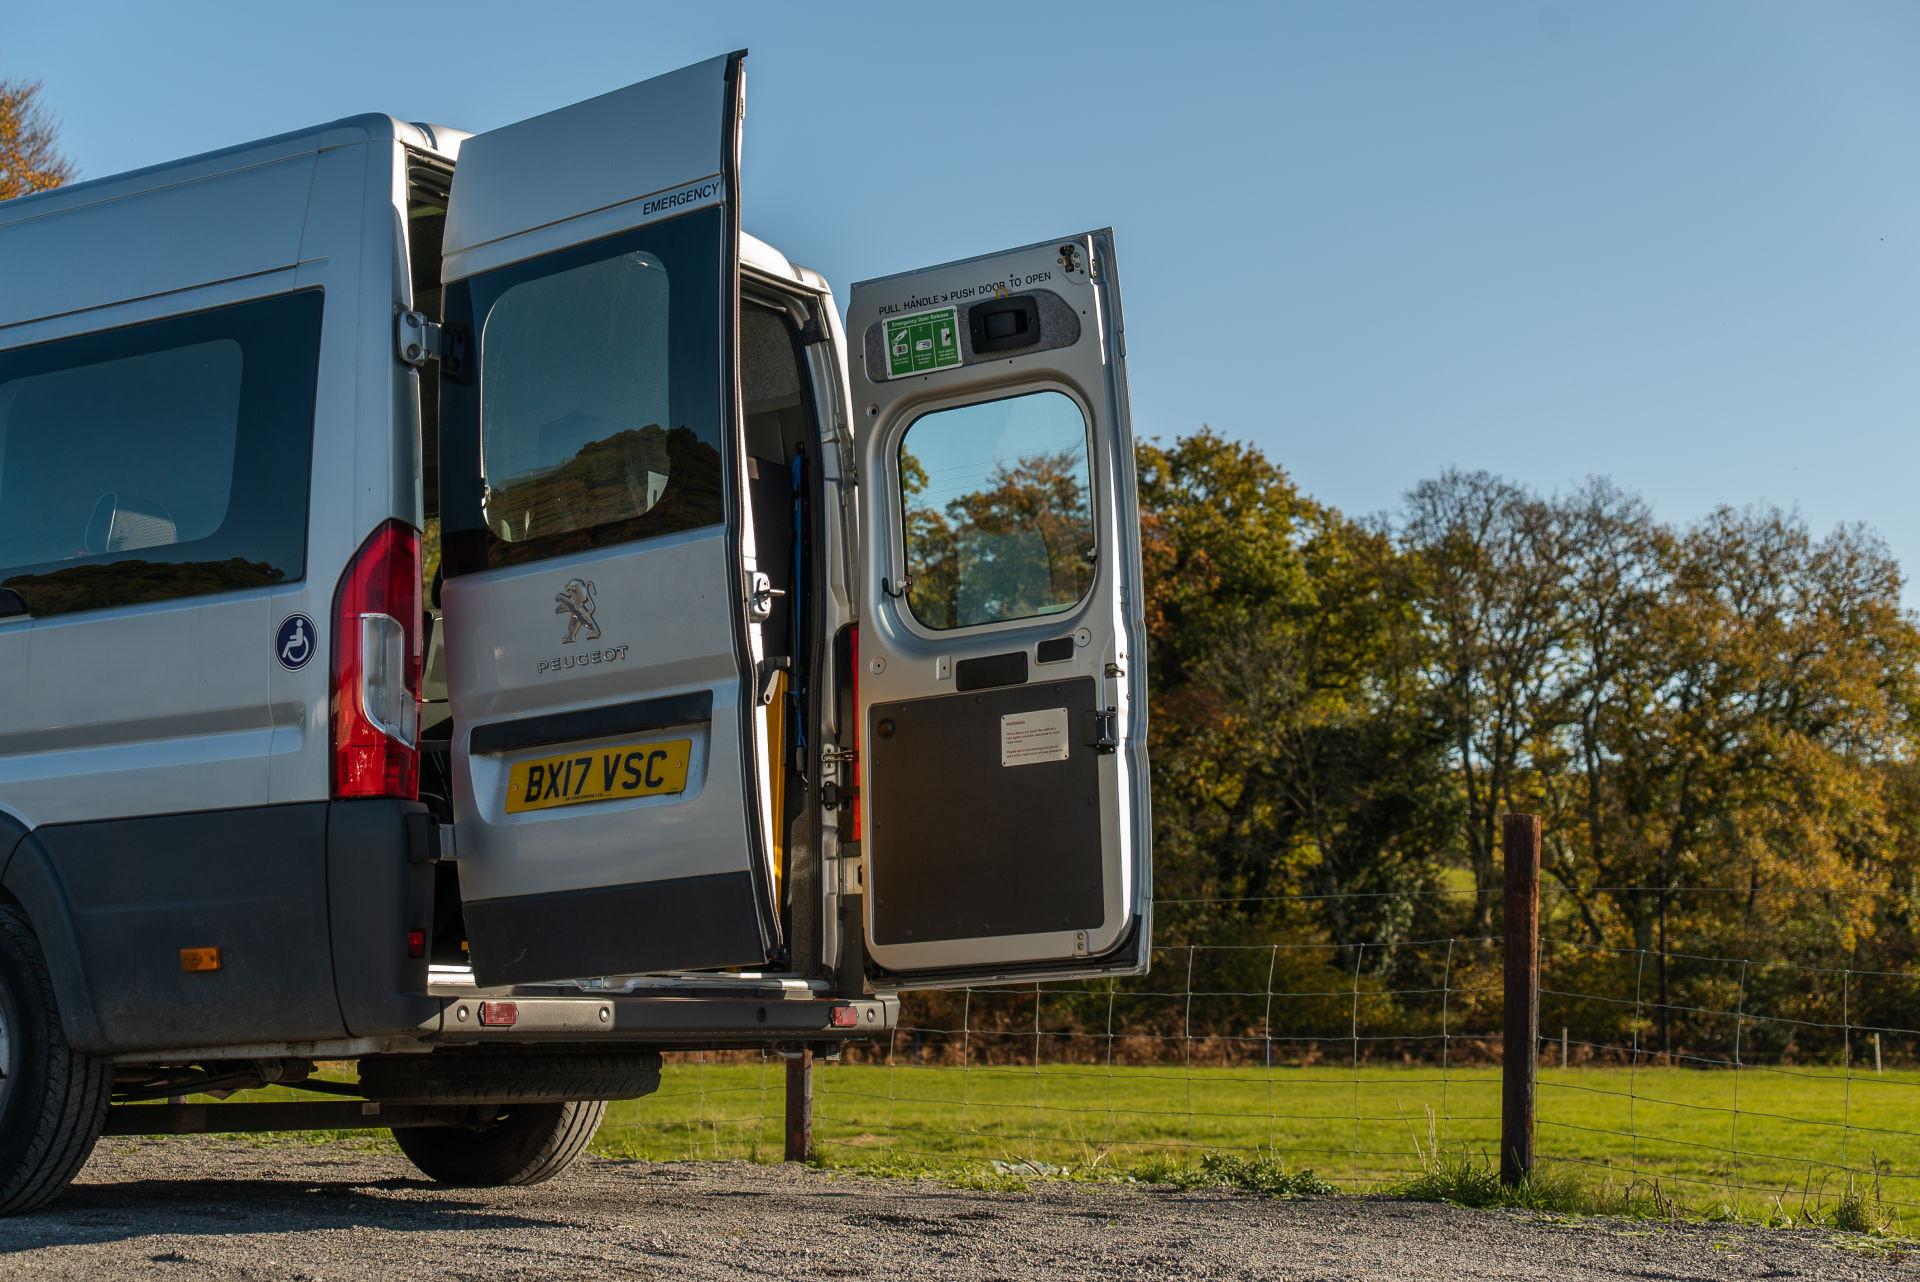 2017 Peugeot Boxer 17 Seater Accessible Minibus for Sale - Image 7